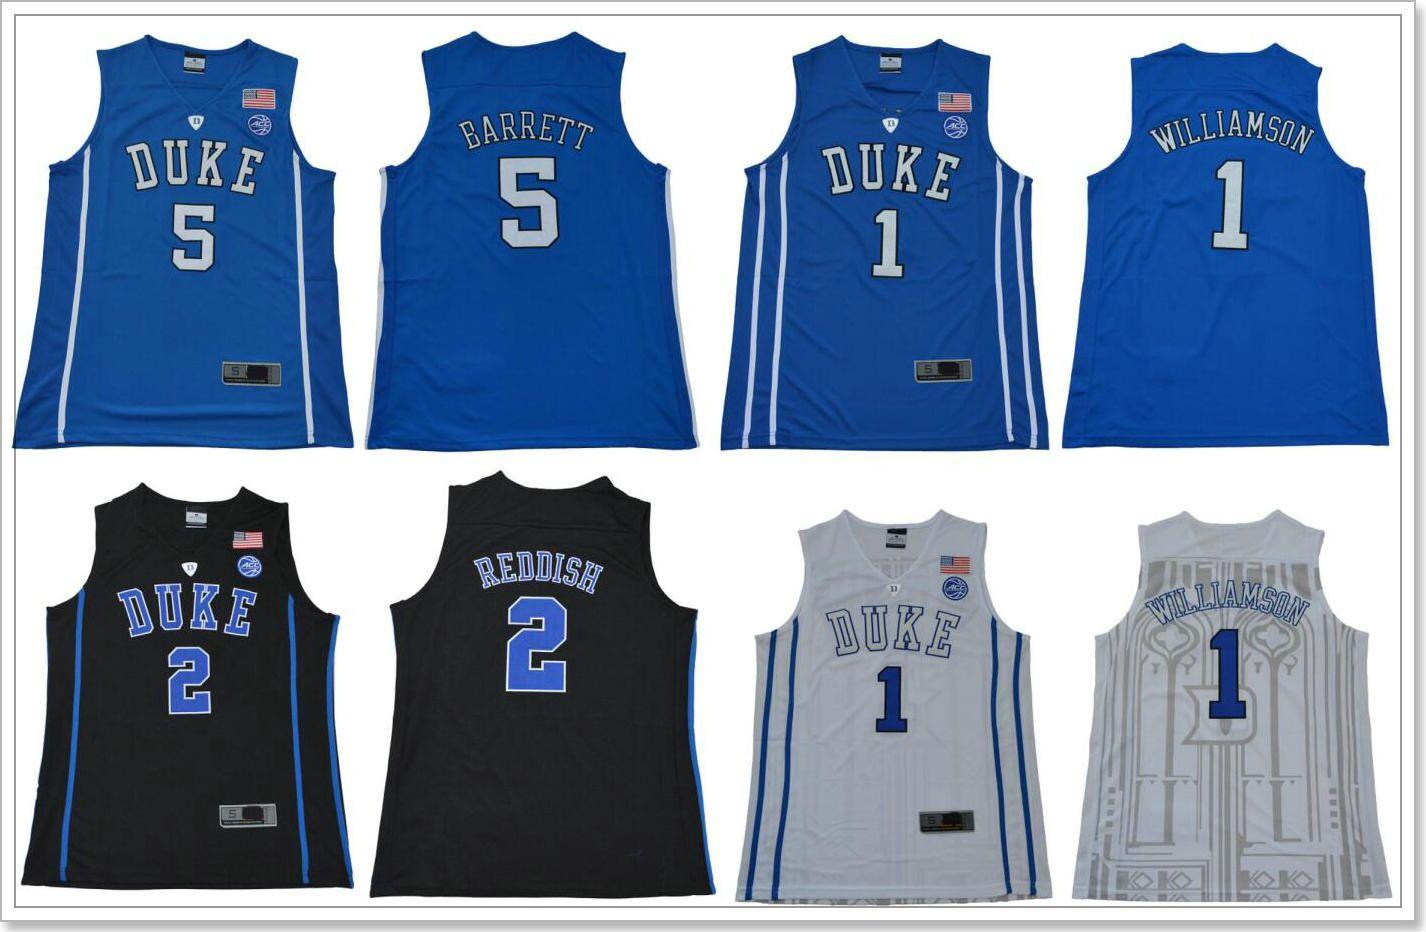 sale retailer 47c40 973e8 Duke Mens Basketball T Shirts | Azərbaycan Dillər Universiteti